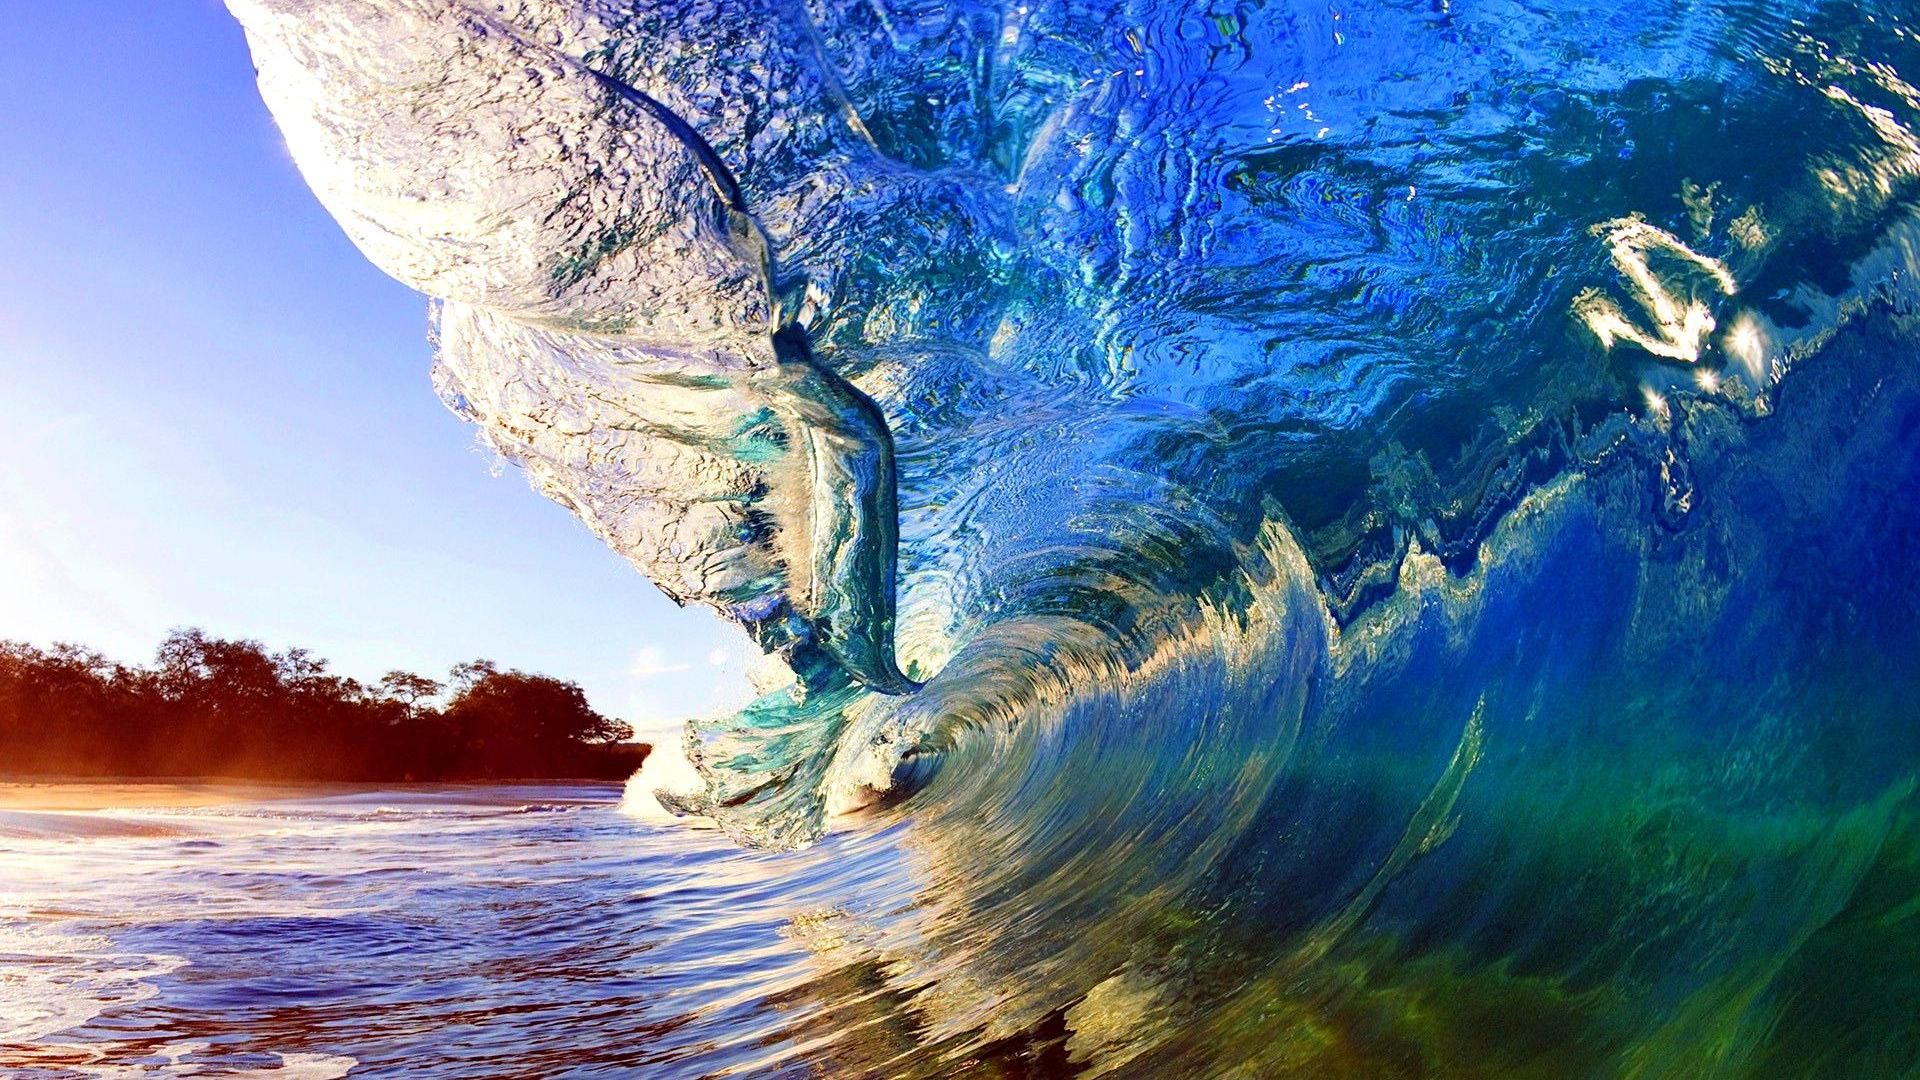 Wave Wallpaper High Resolution Beach Waves Wal...